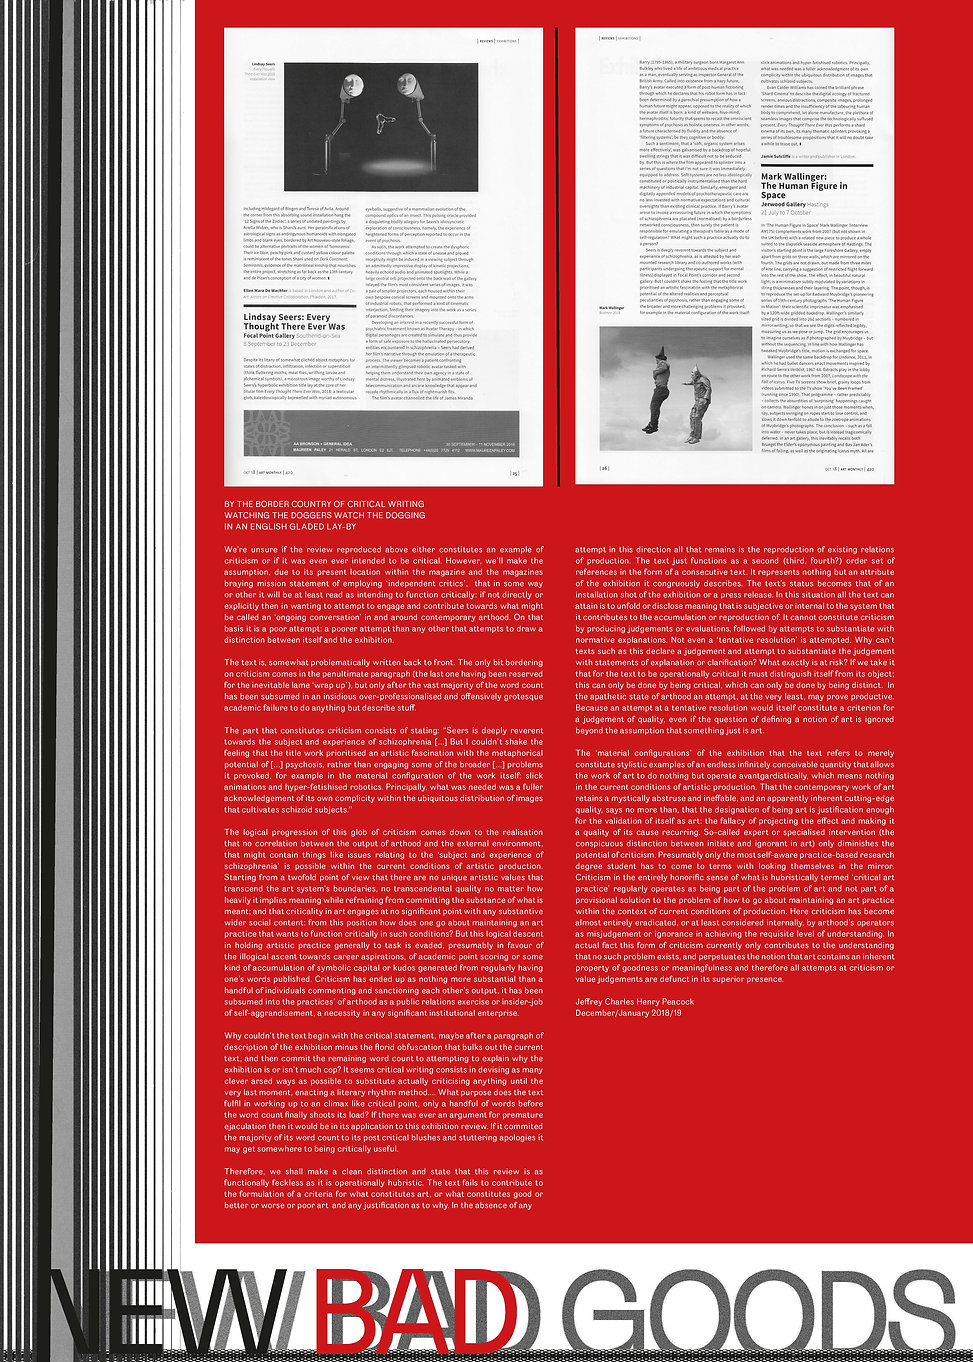 NEWBADGOODS3red_Page_1 copy.jpg